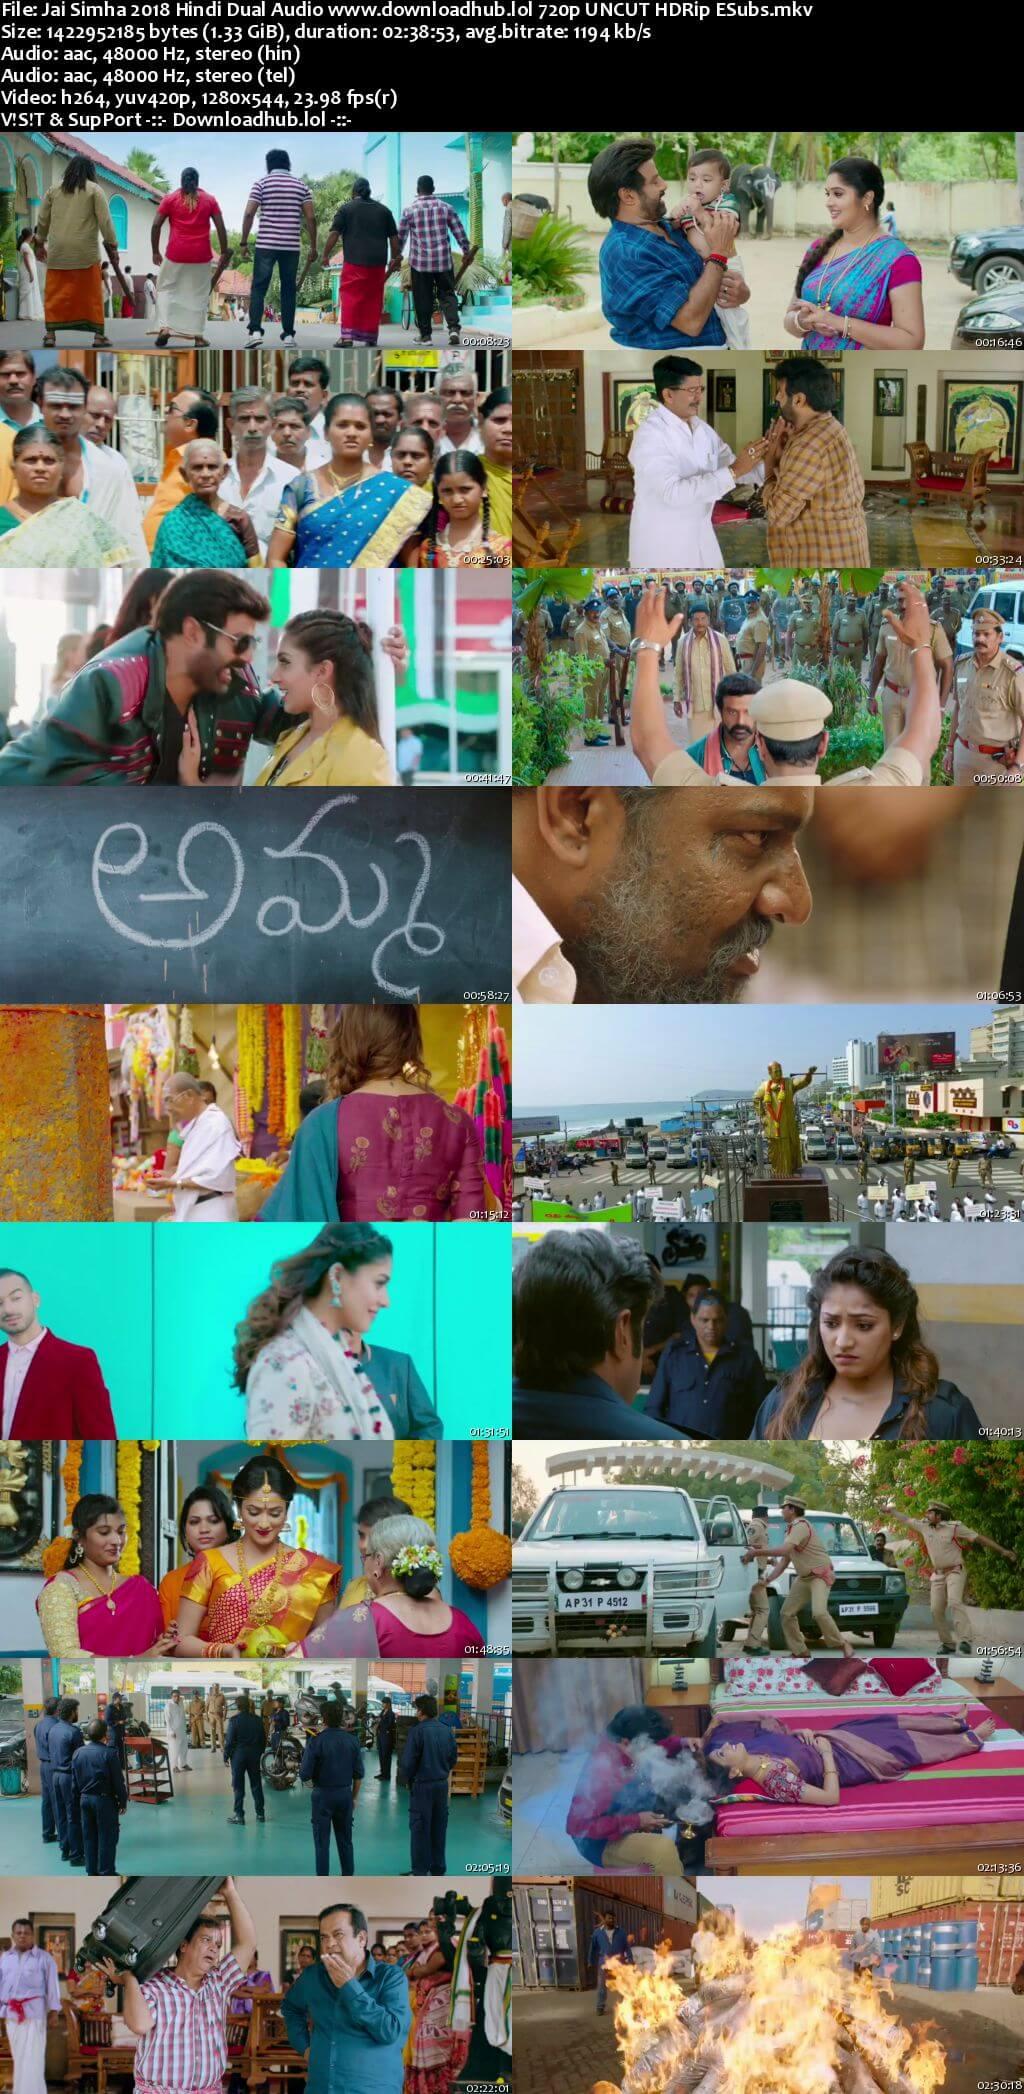 Jai Simha 2018 Hindi Dual Audio Movie Download 720p HDRip